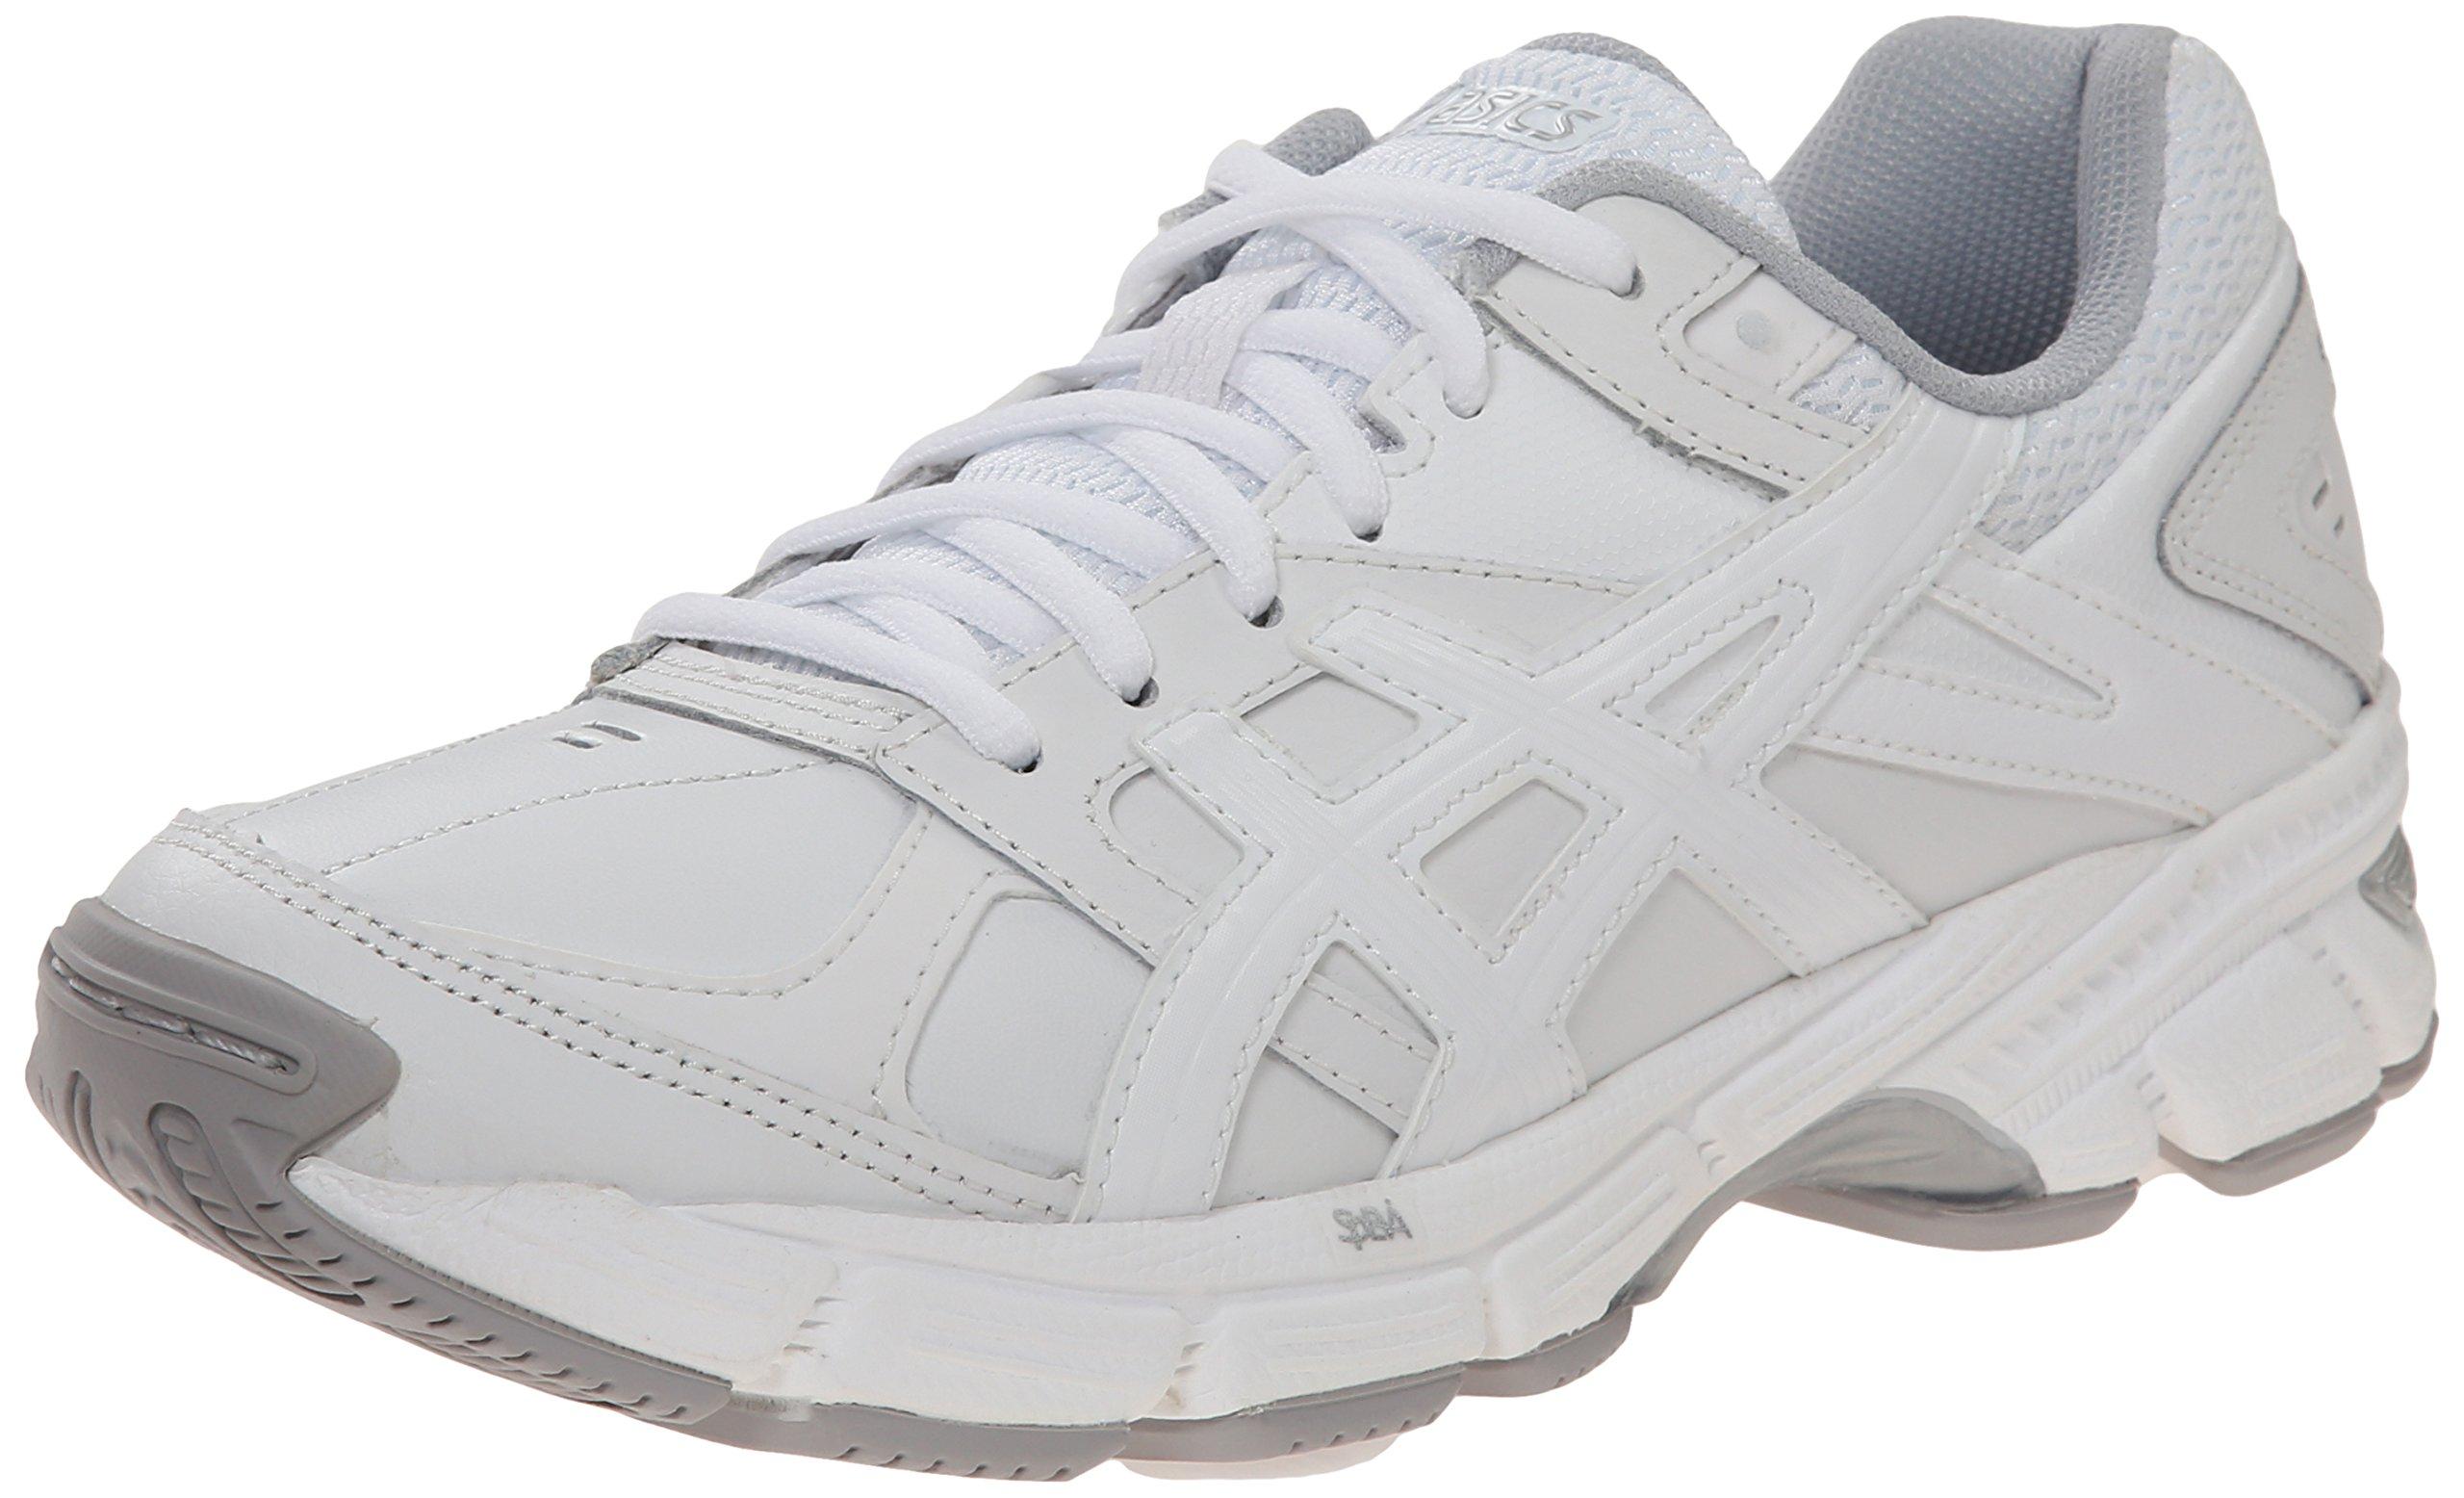 ASICS Women's Gel 190 TR Training Shoe, White/White/Silver, 11 M US